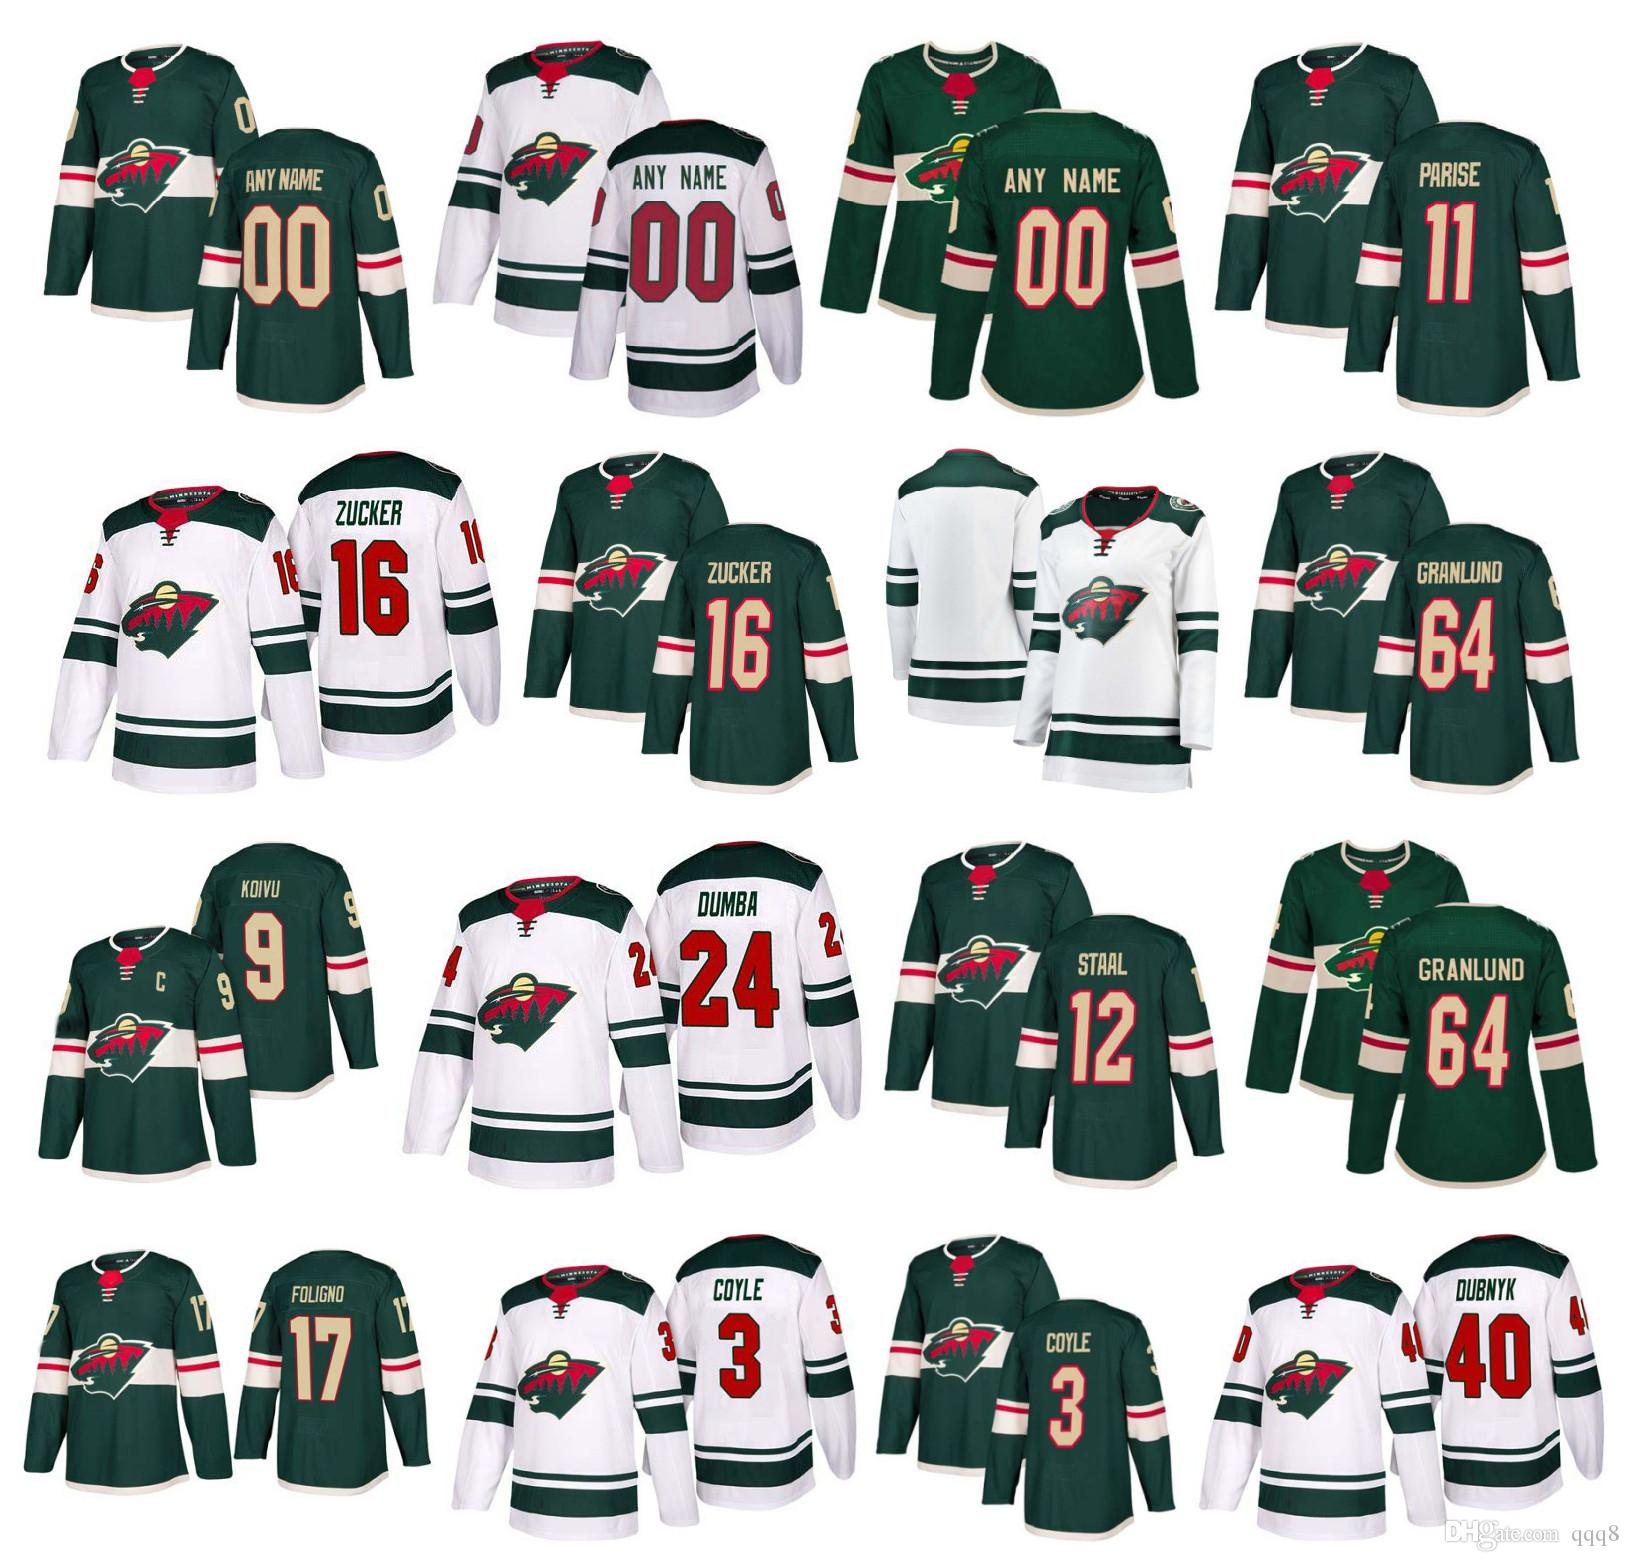 huge selection of 98c4f 46744 Customized Minnesota Wild Jersey Jason Zucker Zach Parise Mikael Granlund  Matt Dumba Eric Staal Ryan Suter Mikko Koivu Coyle Stitched Hockey